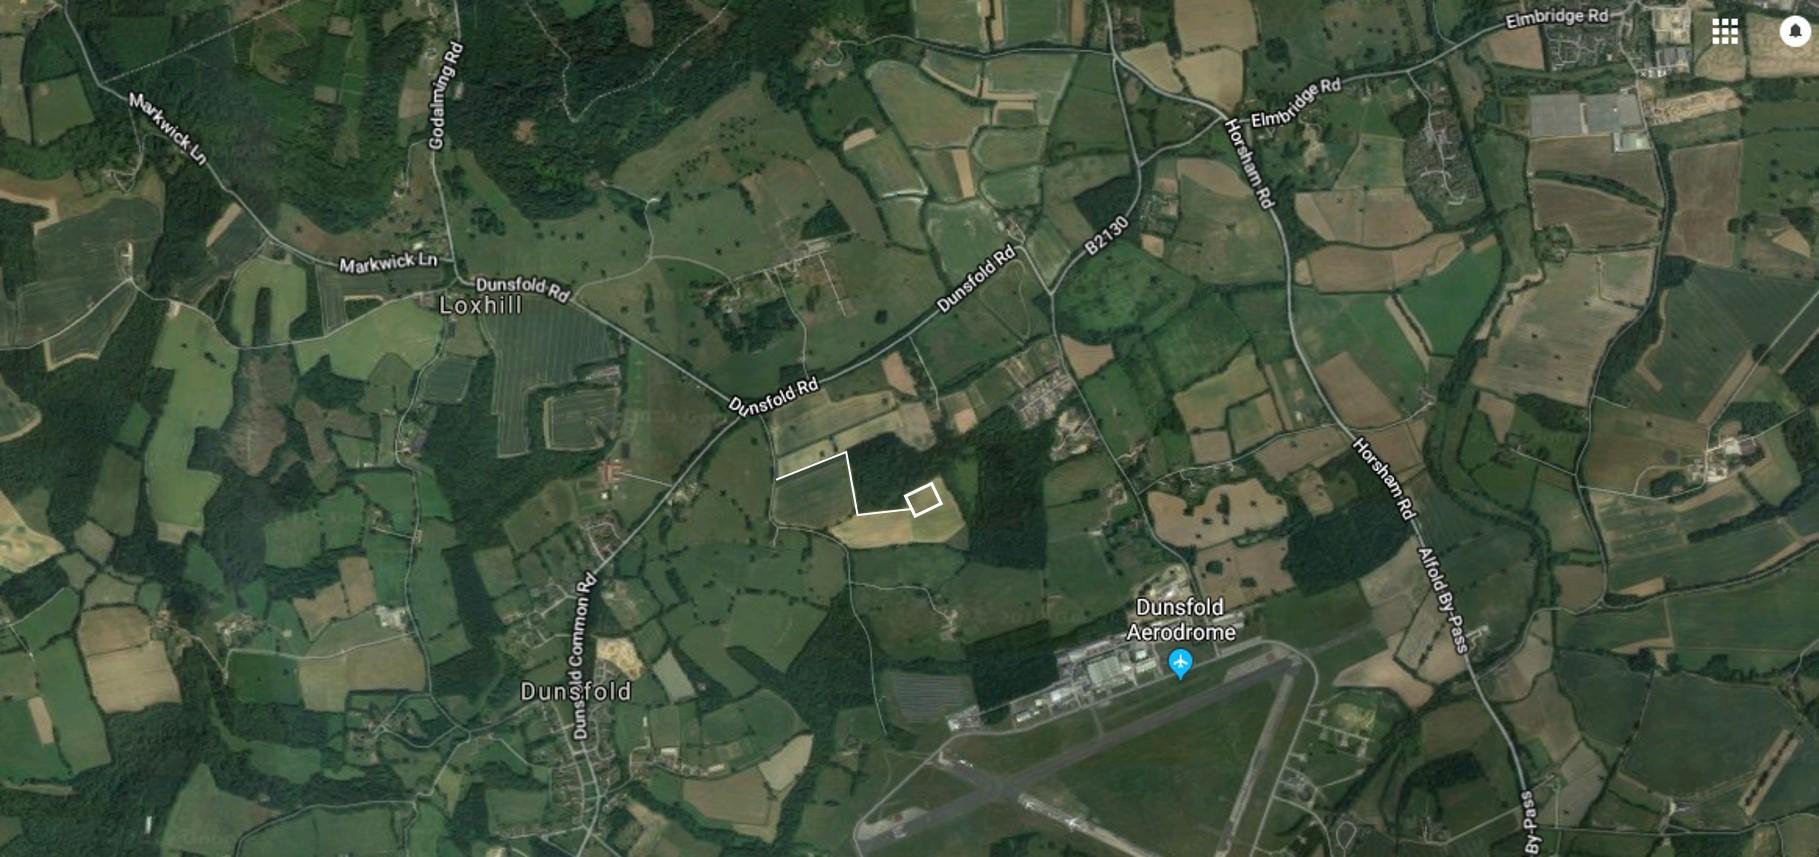 Dunsfold Google Maps small